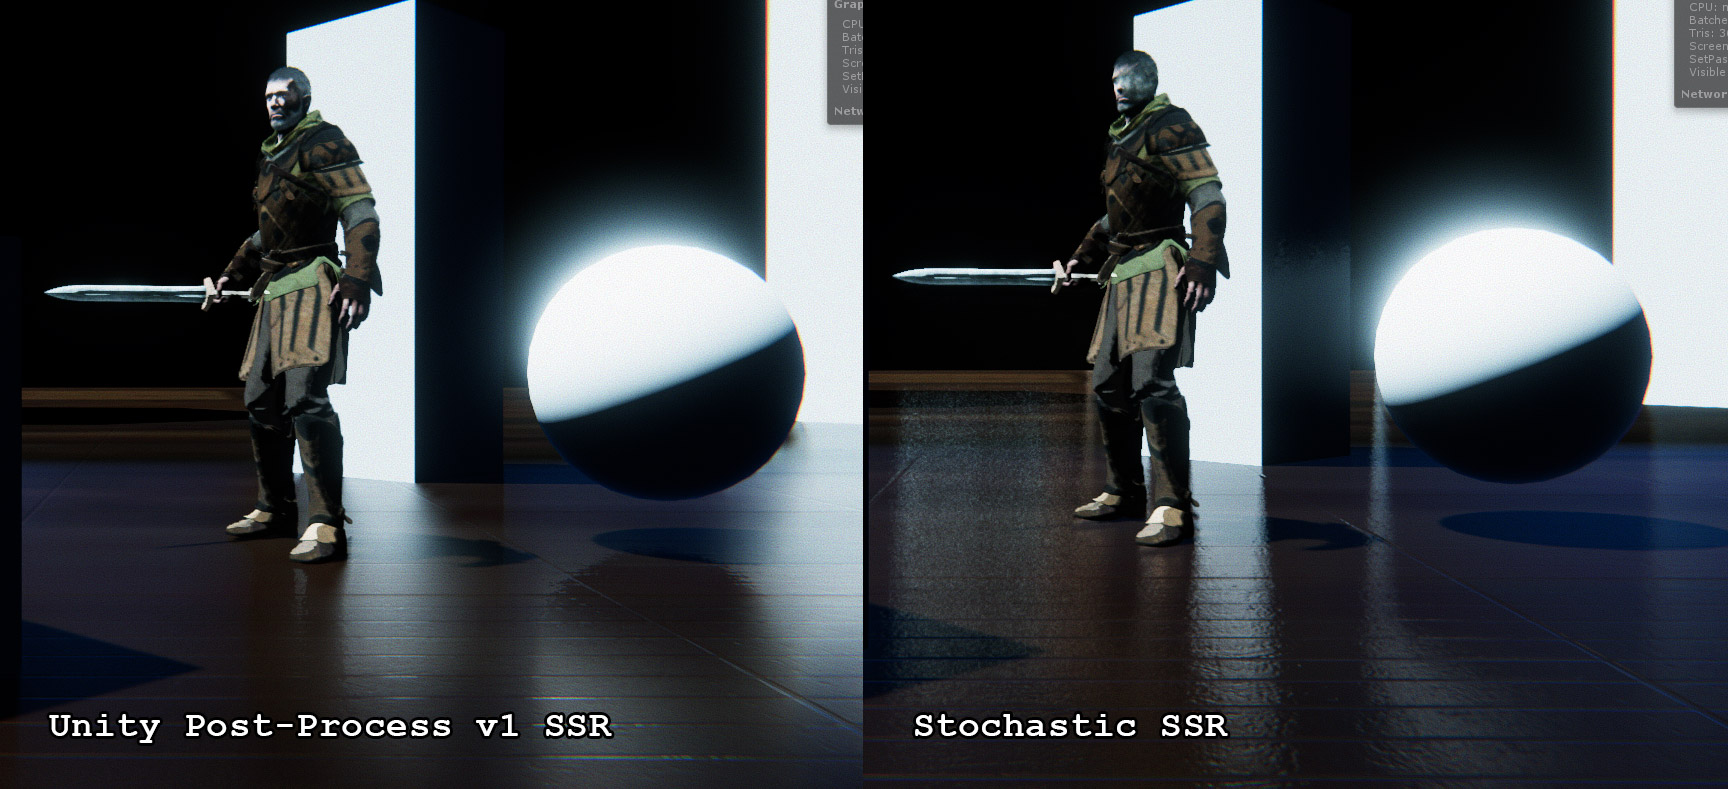 ssr_comparison.jpg